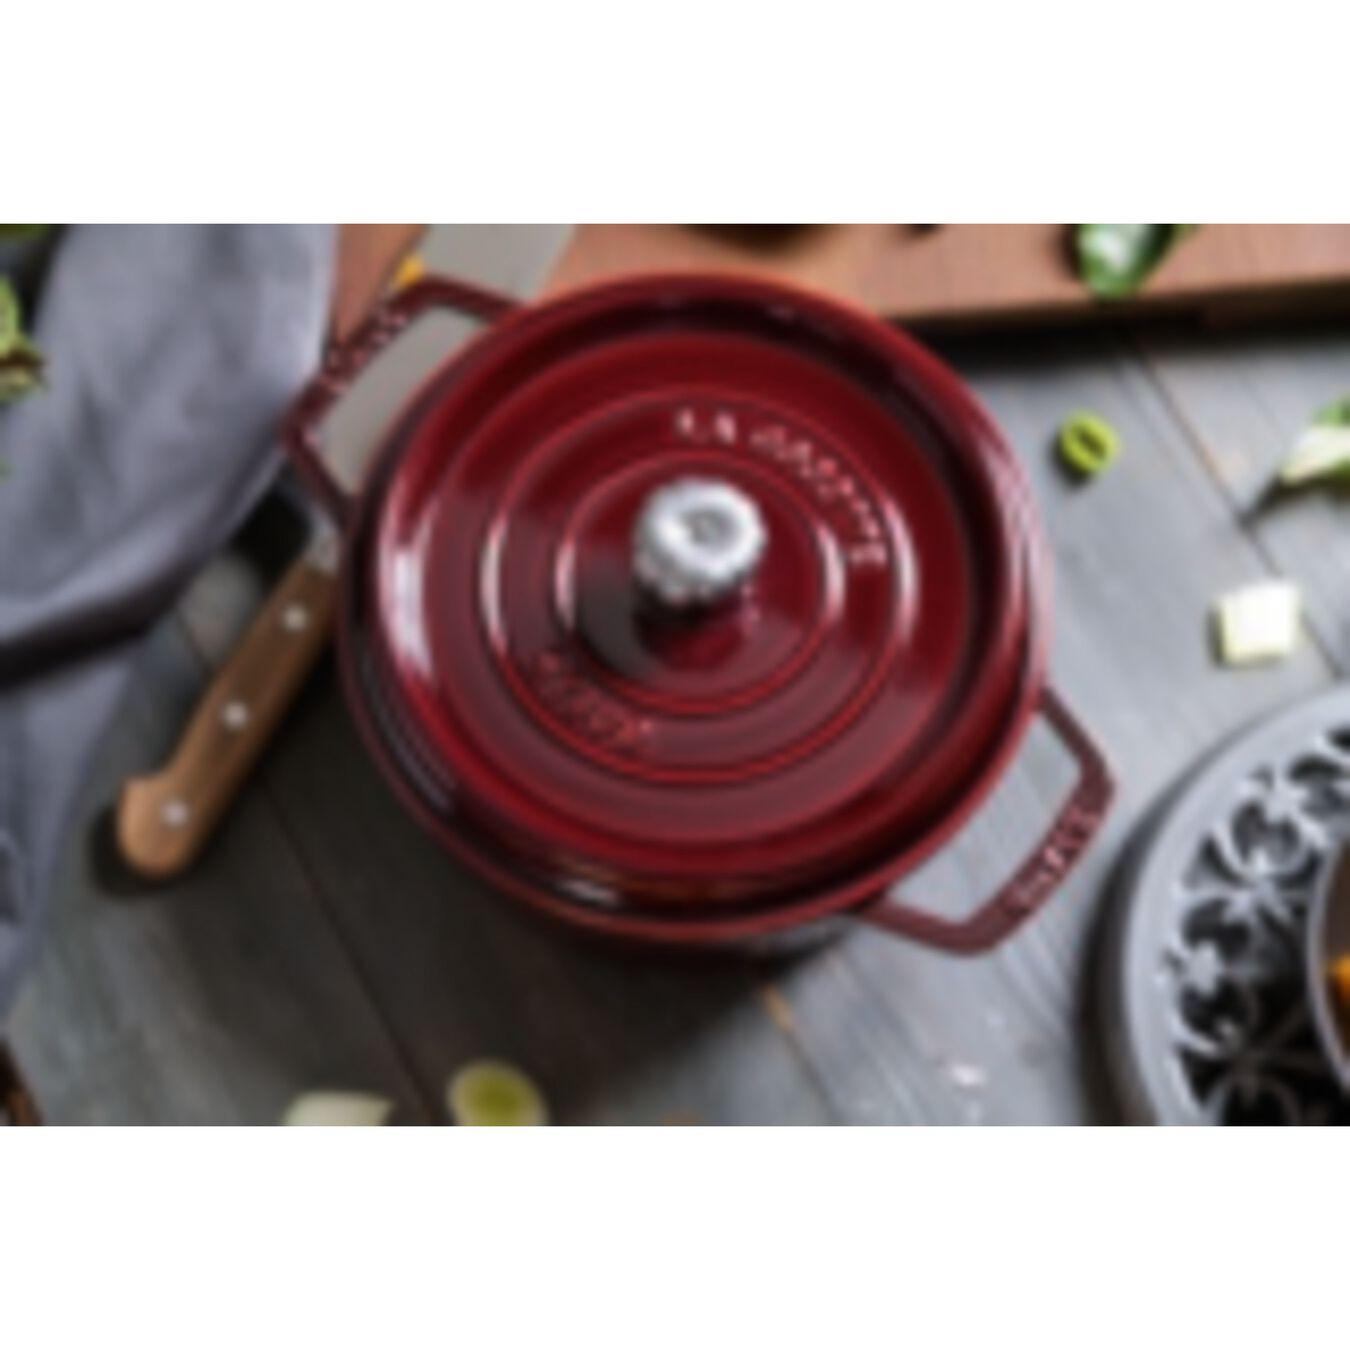 Cocotte 24 cm, rund, Grenadine-Rot, Gusseisen,,large 3